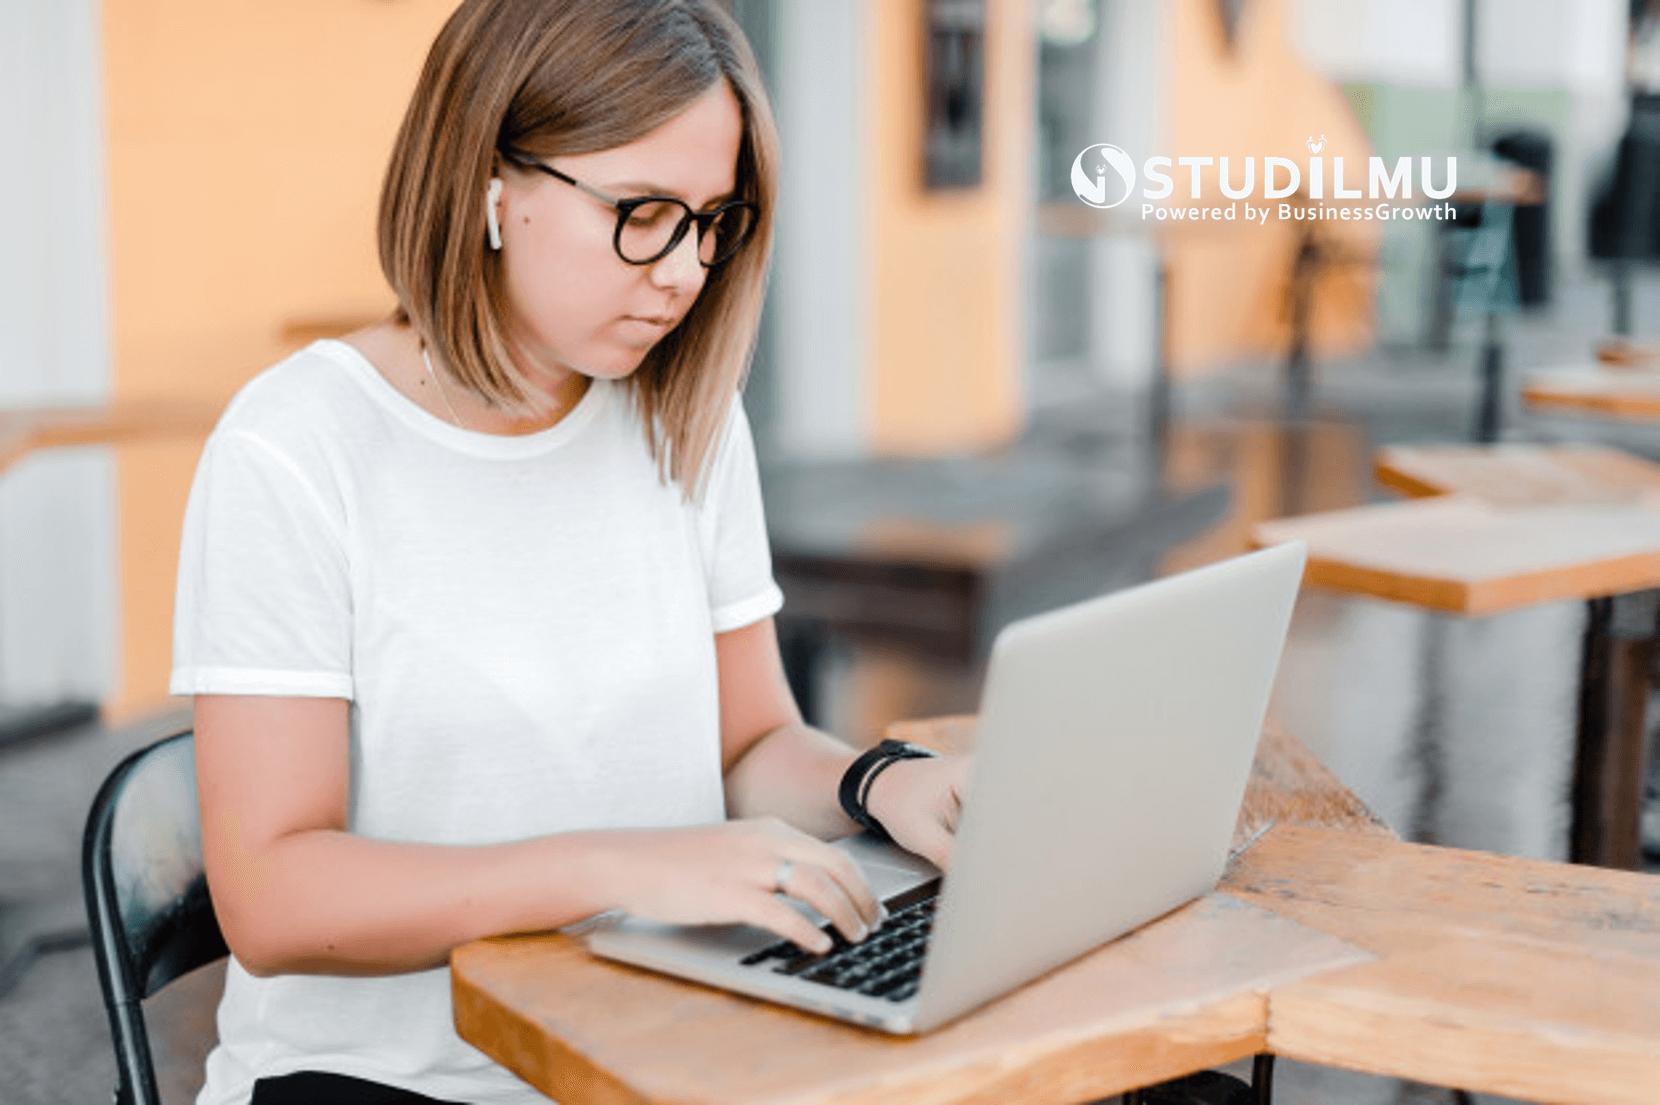 STUDILMU Career Advice - 4 Hal yang Perlu Diketahui Sebelum Menjadi Penulis Freelance